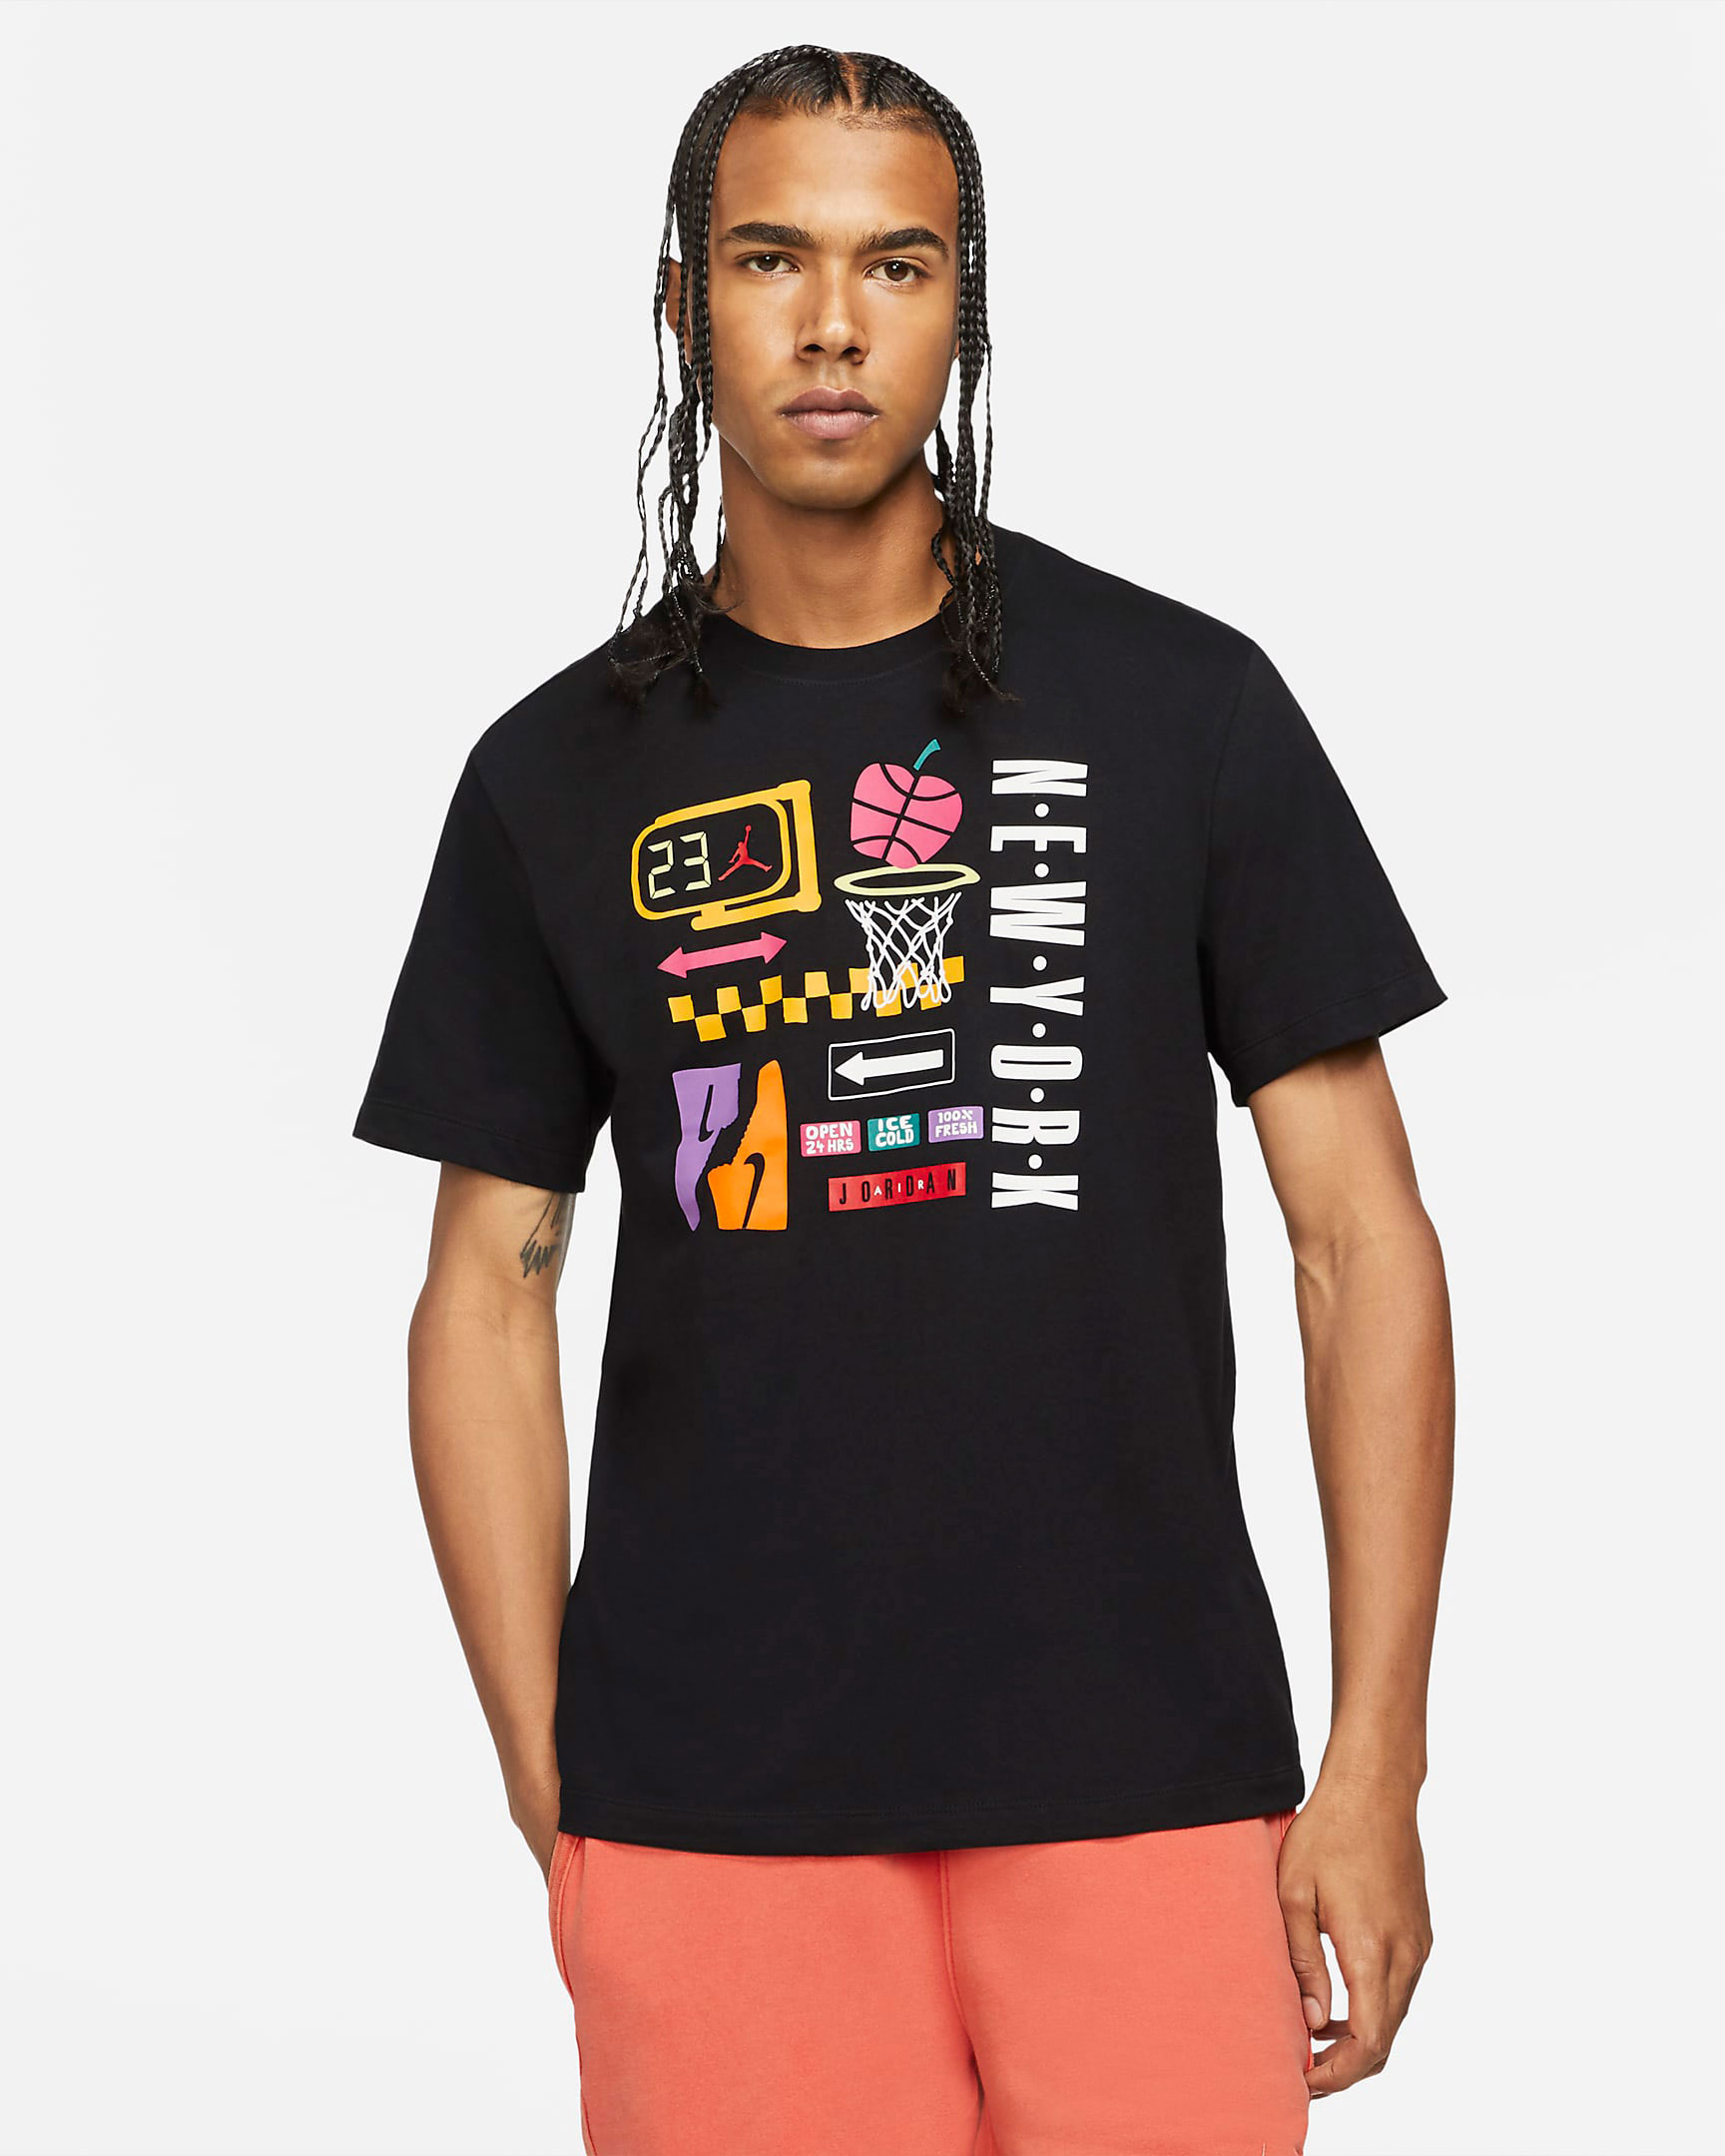 j-balvin-air-jordan-1-matching-t-shirt-3